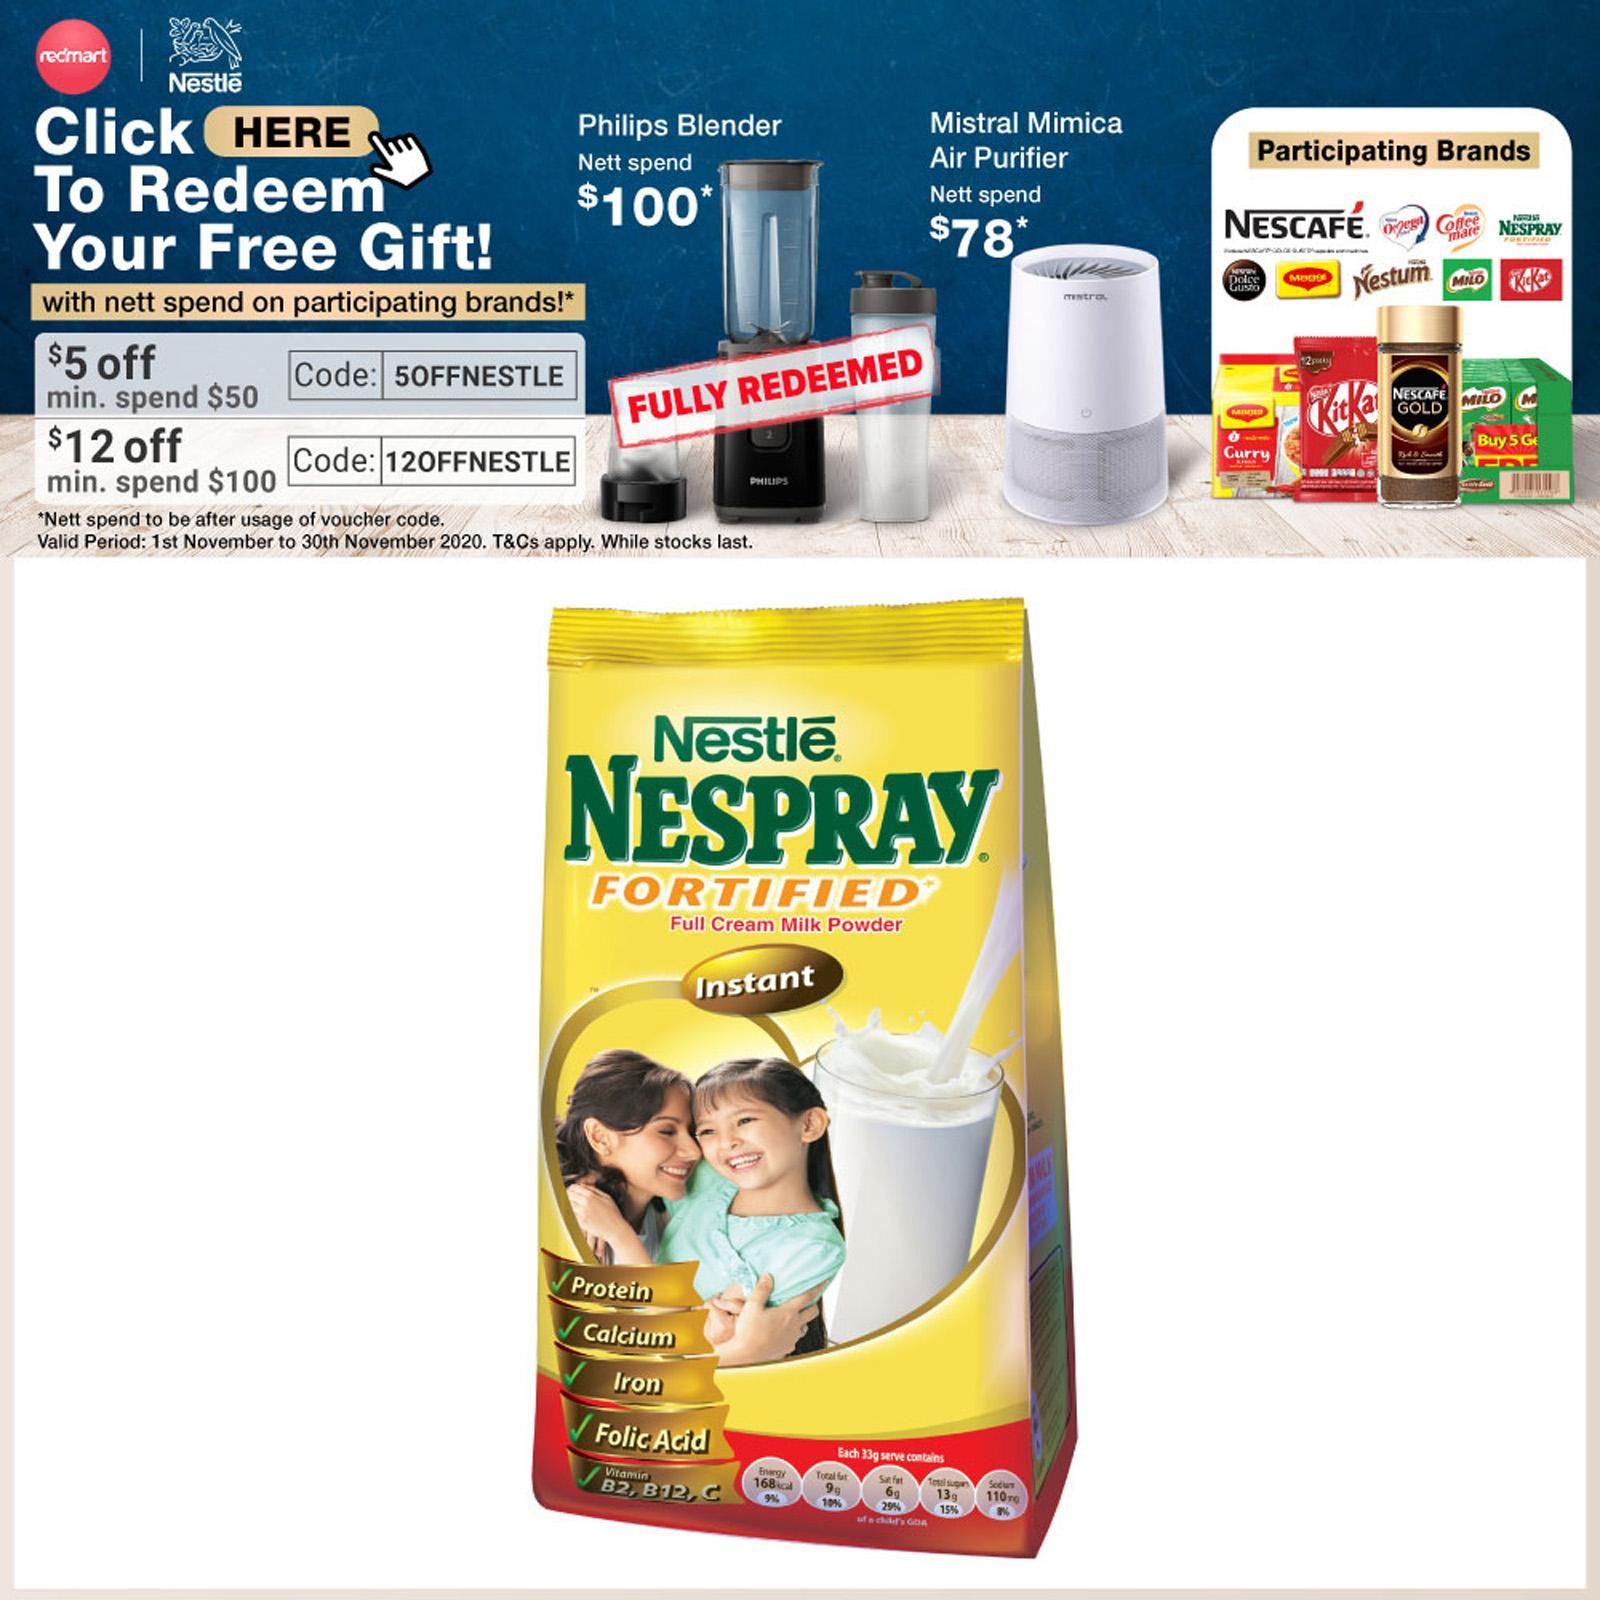 NESPRAY Nespray Fortified Full Cream Milk Powder 600g